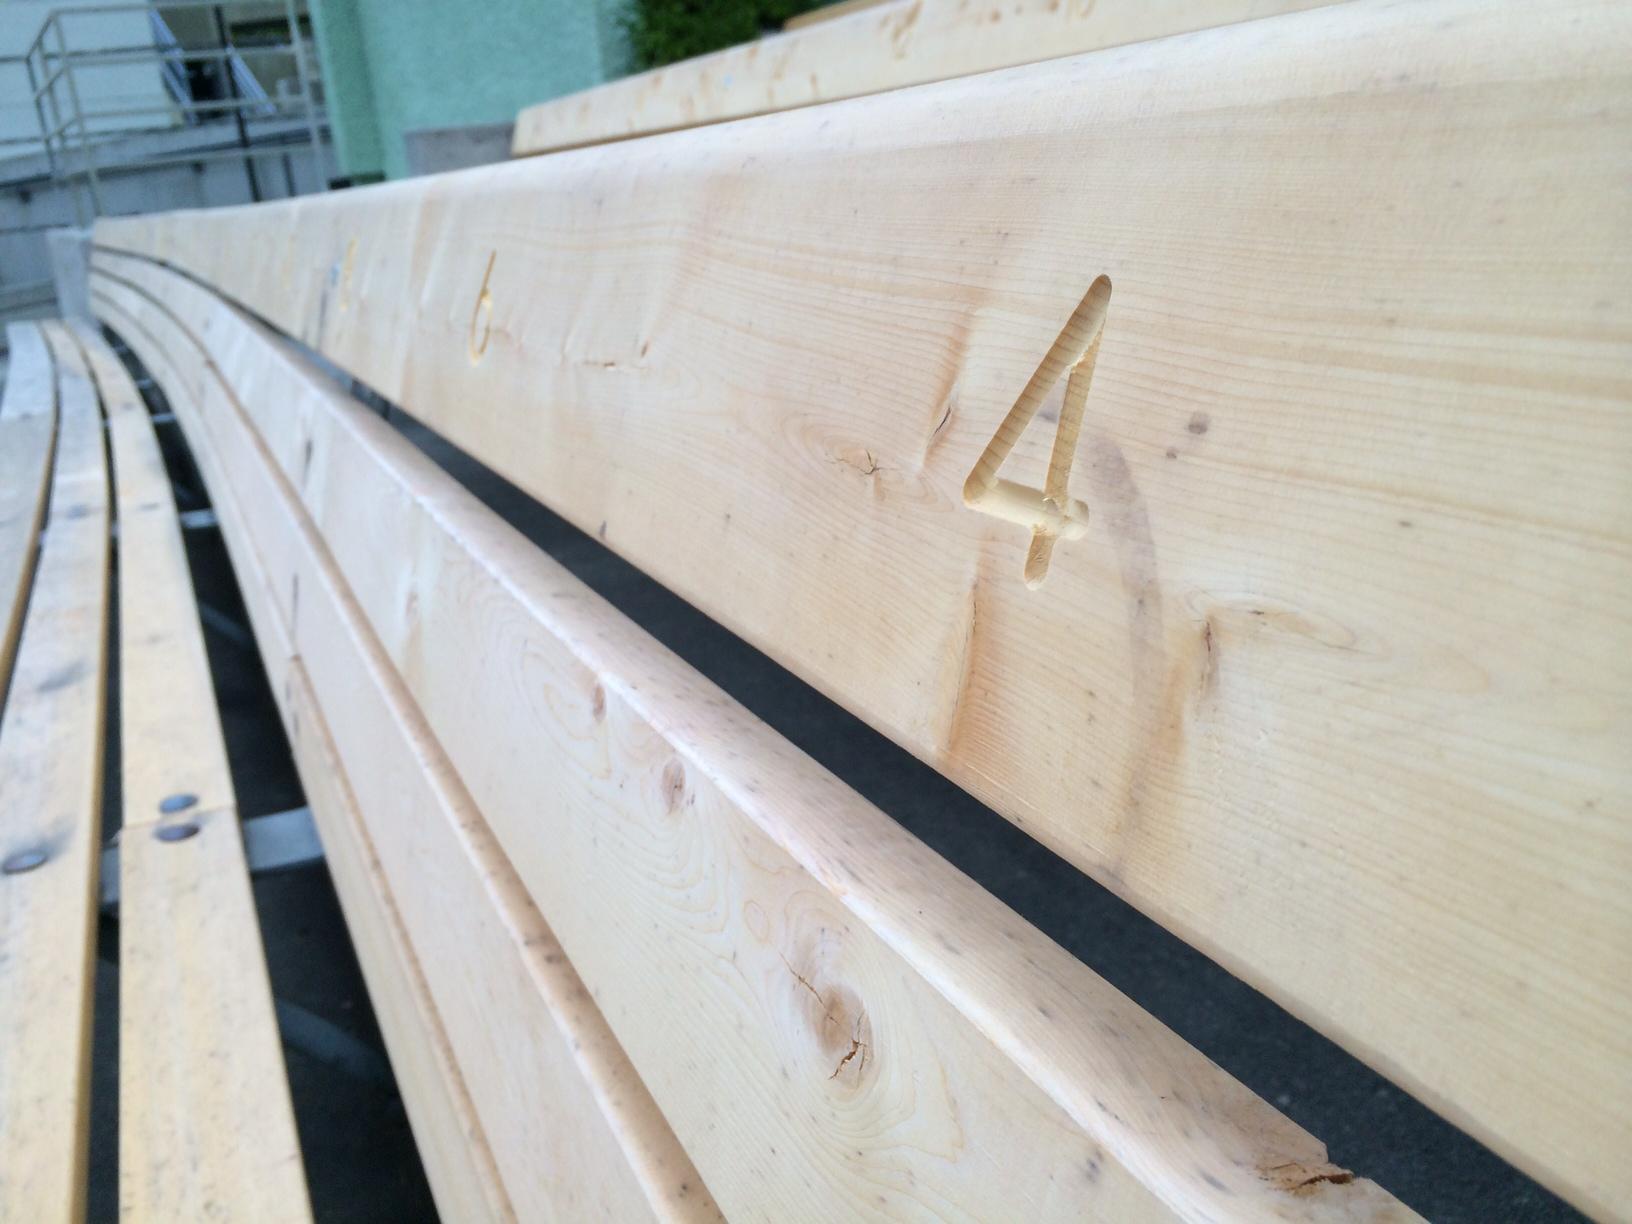 benchnumbers